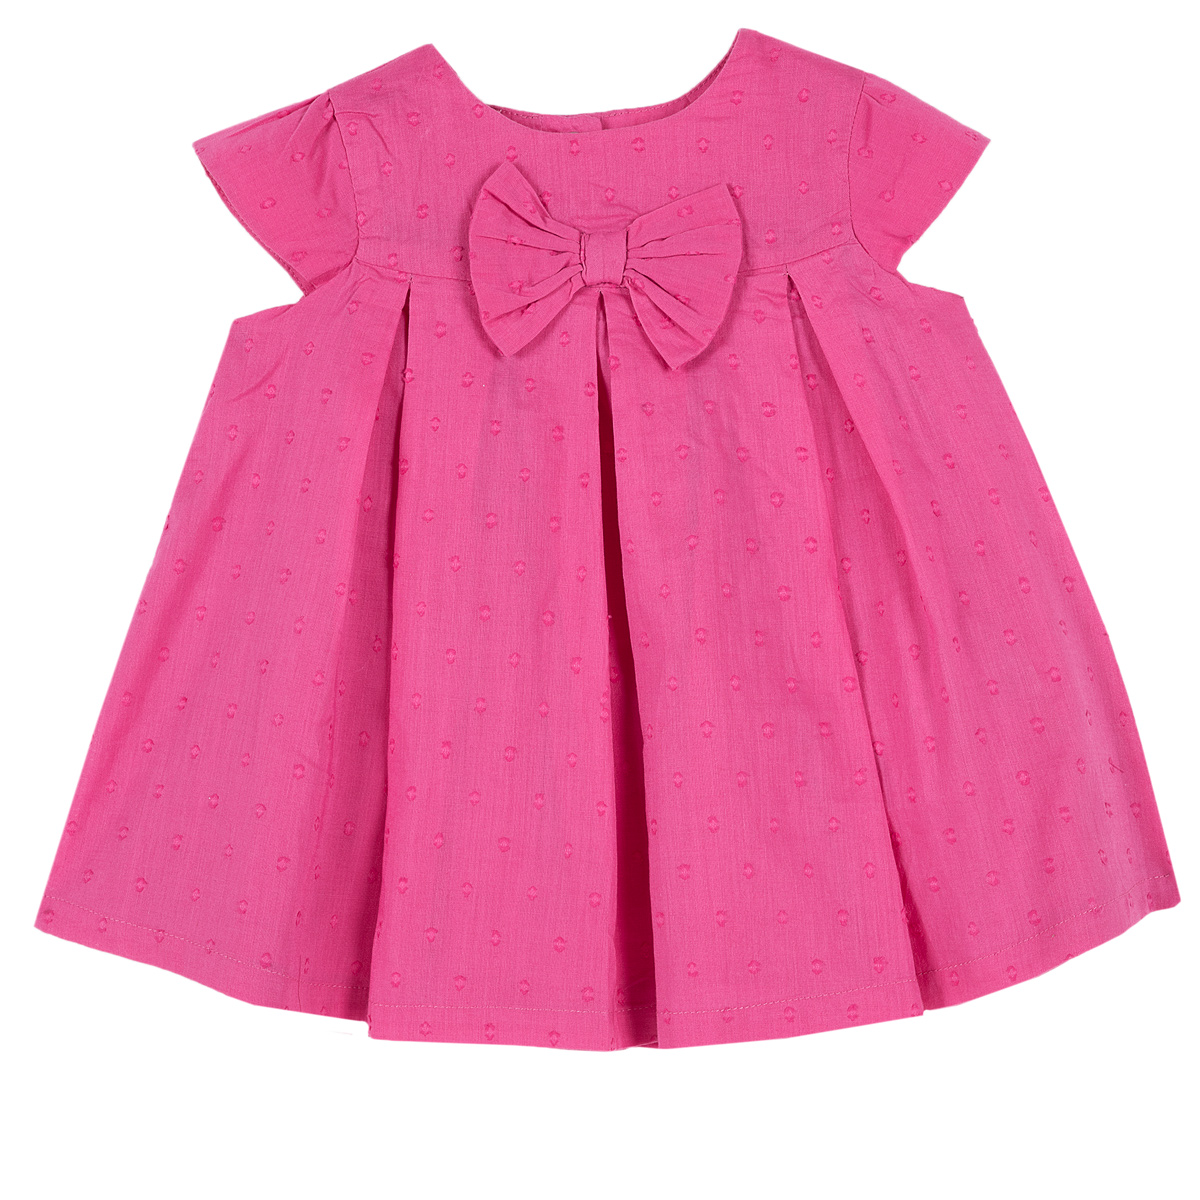 Rochita eleganta Chicco, maneca scurta, roz, 03448 din categoria Rochii, Fuste